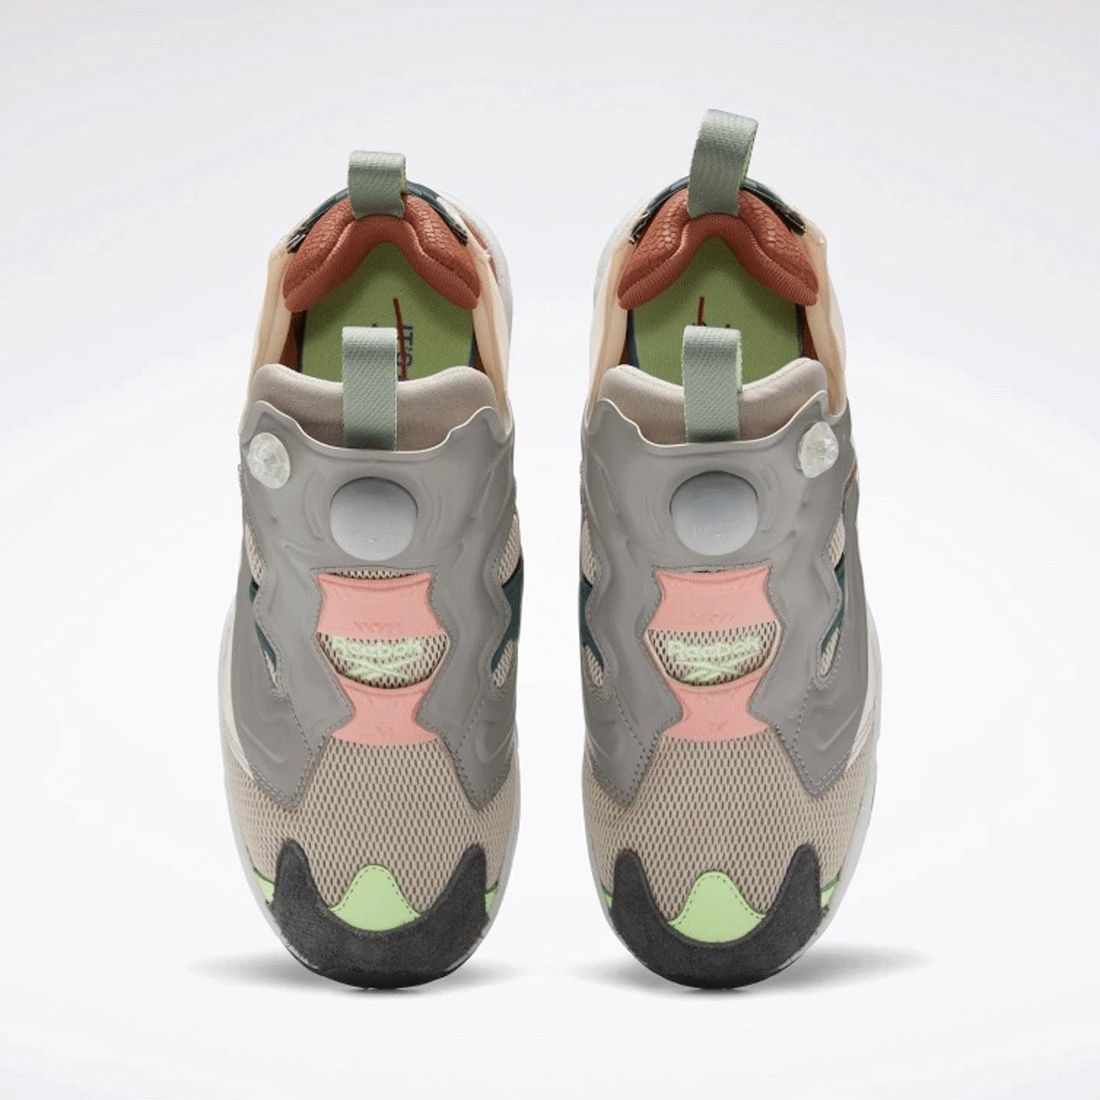 Reebok Instapump Fury Ceramic Pink FX4995 Release Date Info